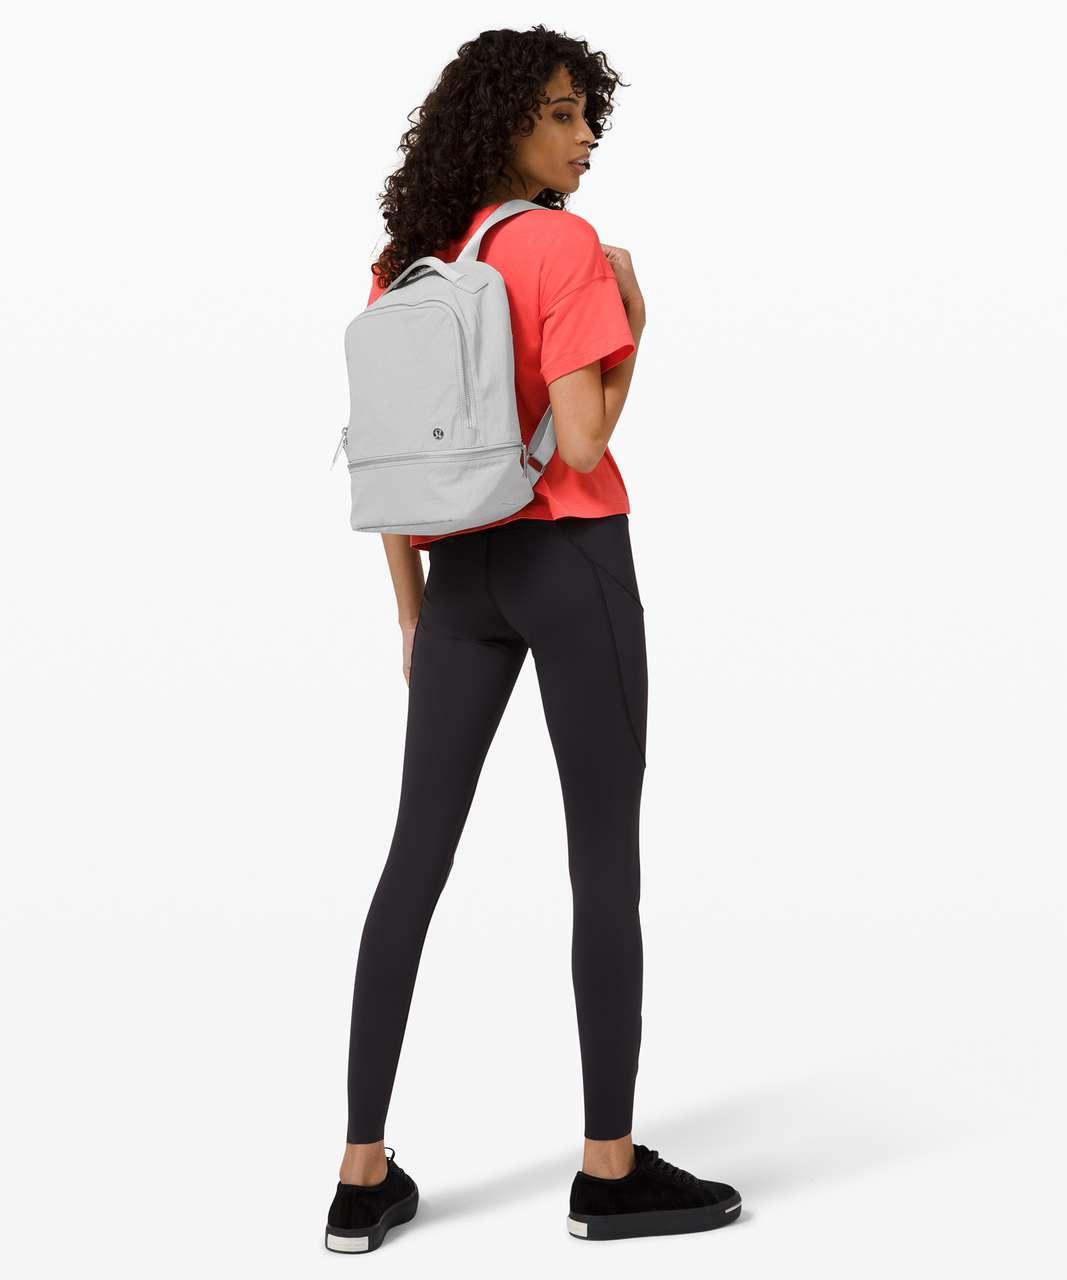 Lululemon City Adventurer Backpack Mini 10L - Silver Drop